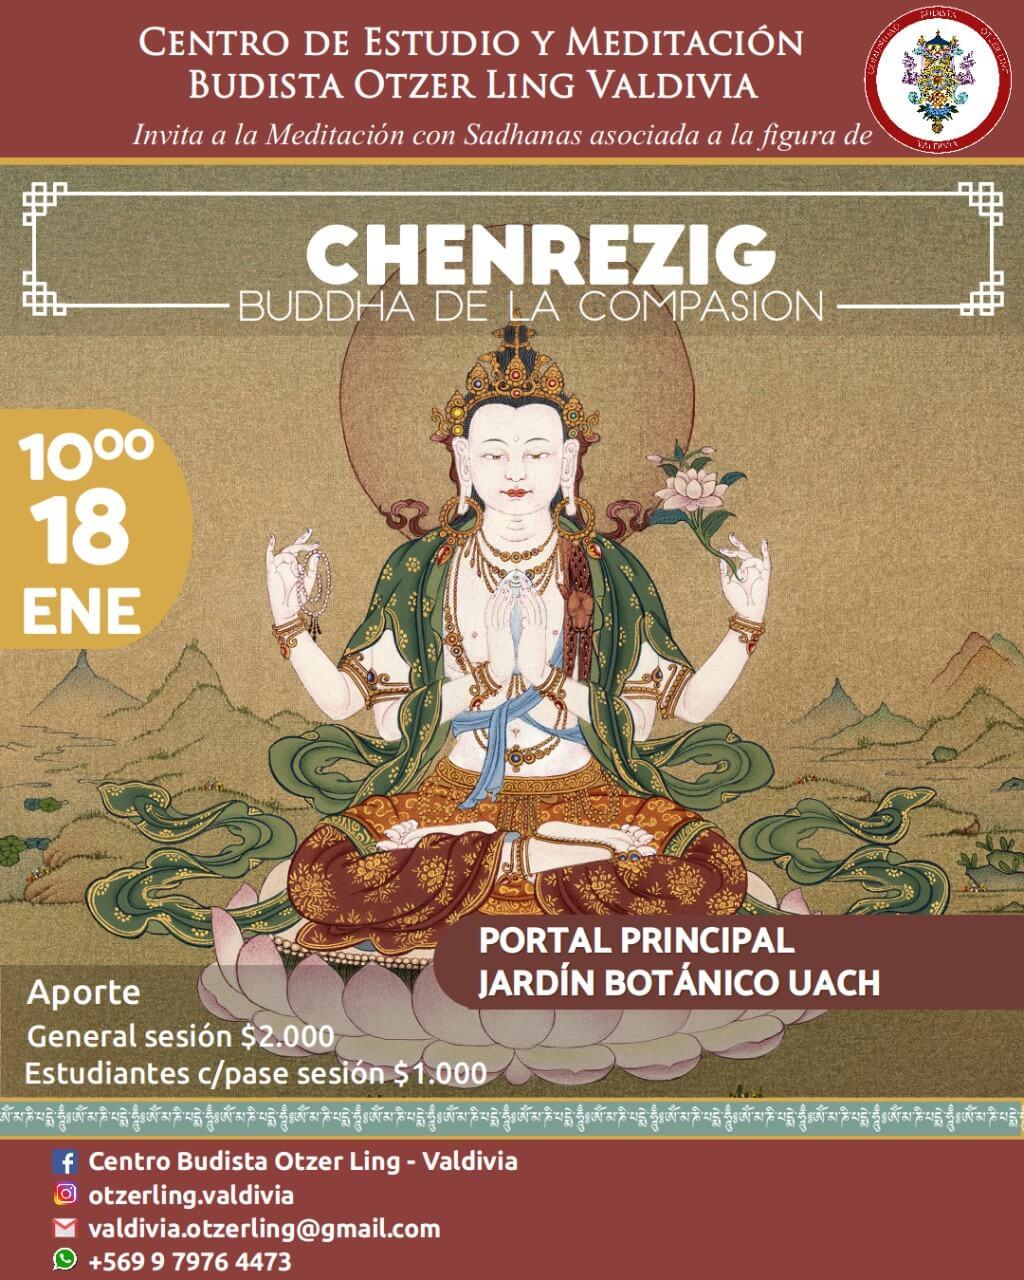 Chenrezig; Buddha de la Compasion